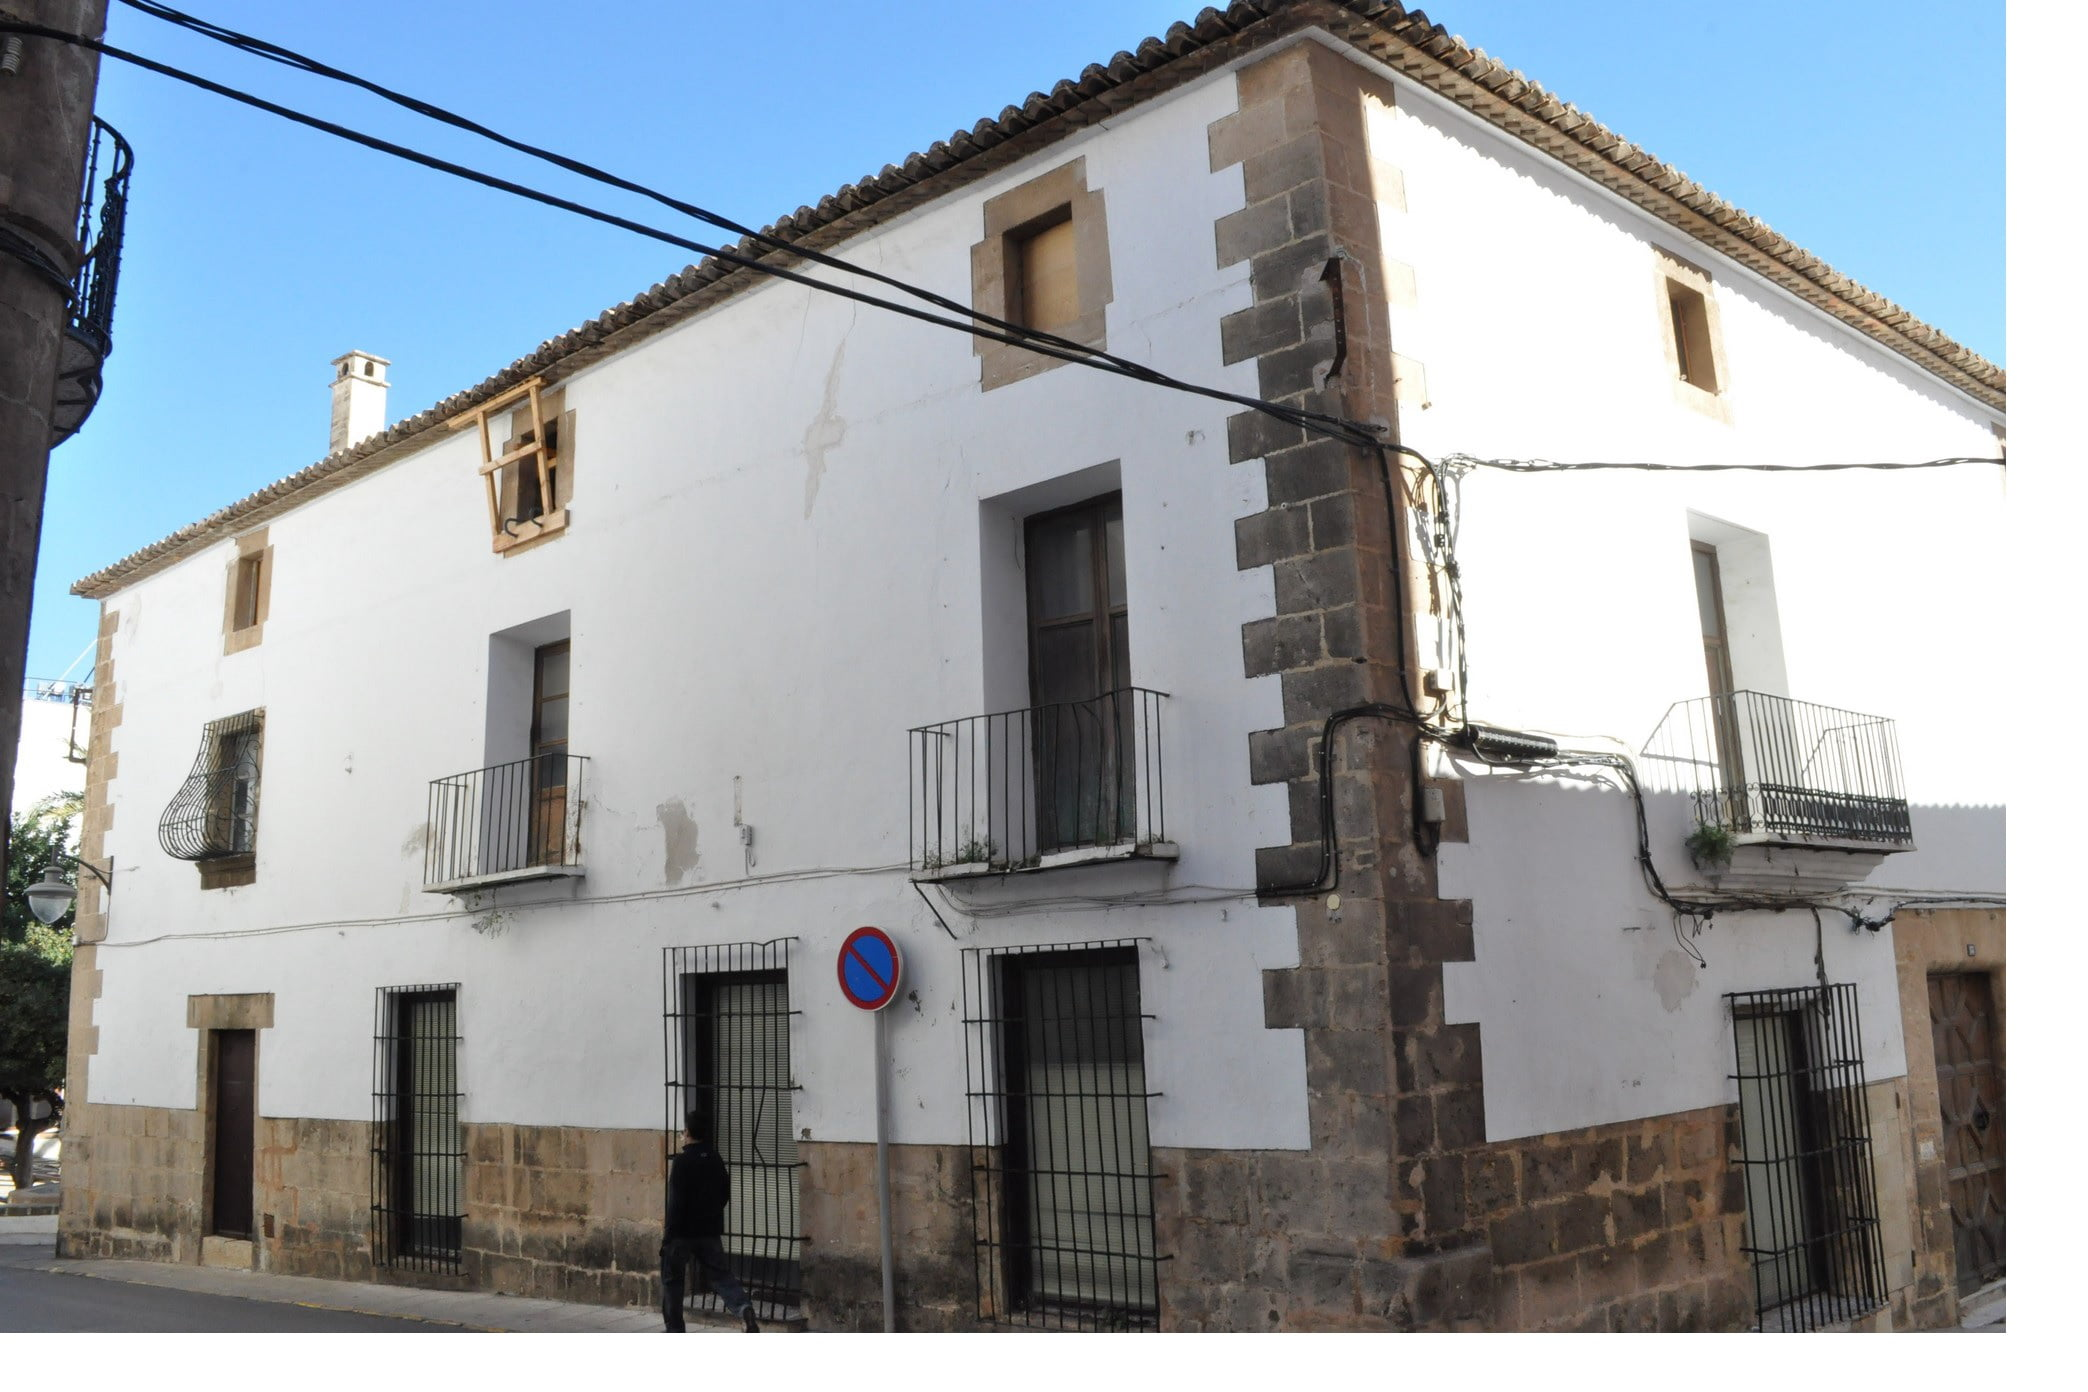 Casa Xolbi o Candelaria